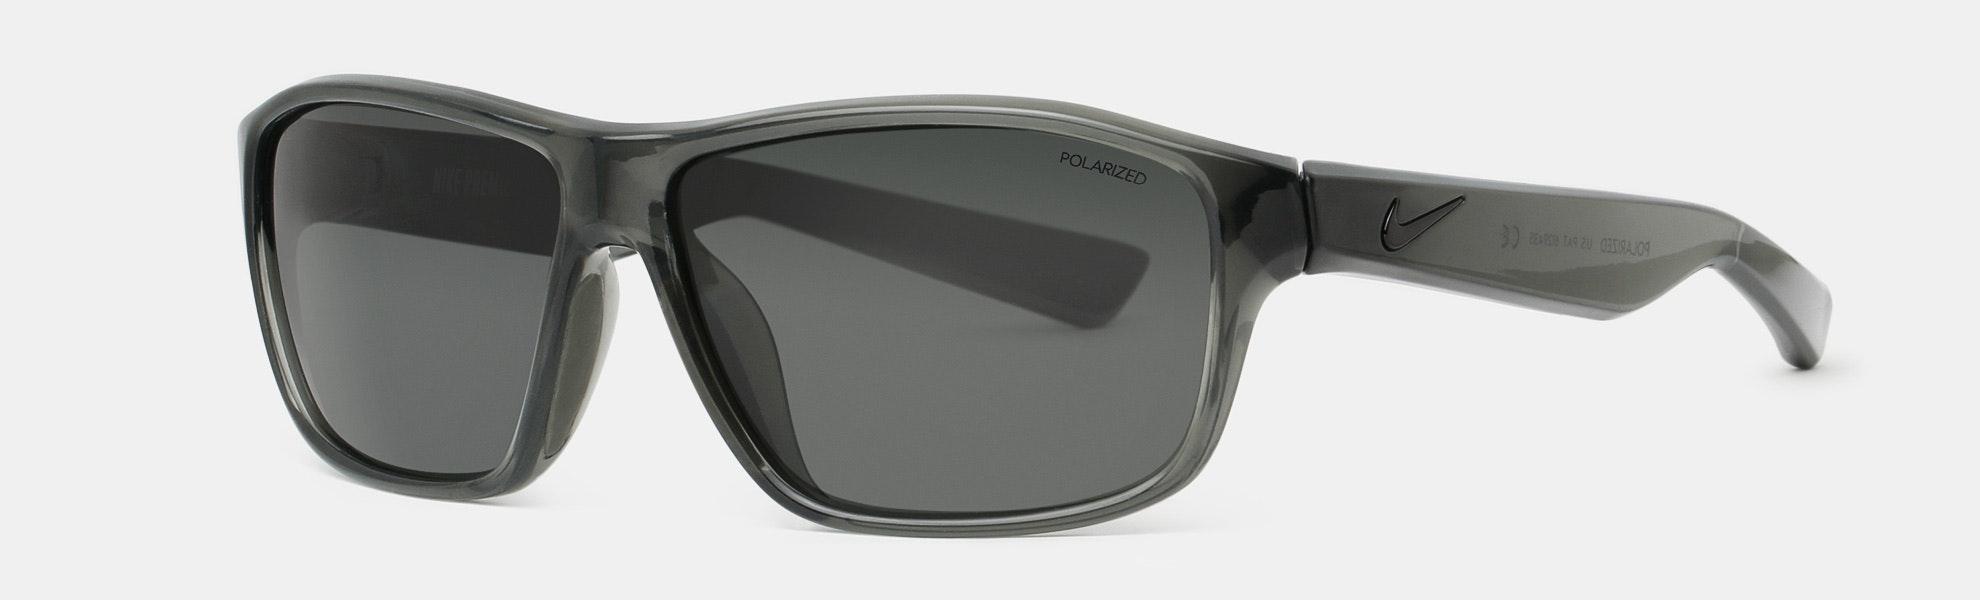 Nike Premier 6.0 Polarized Sunglasses